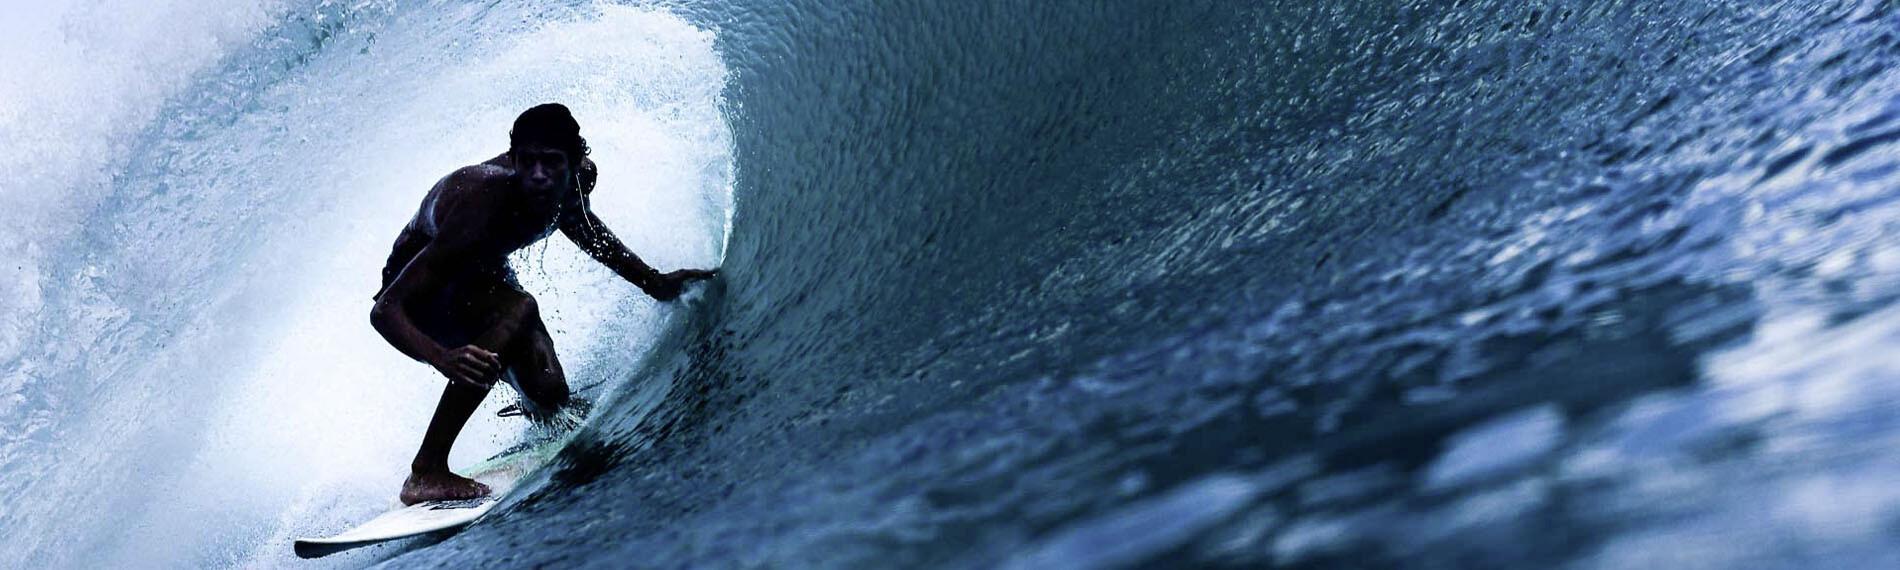 Große Welle surfen